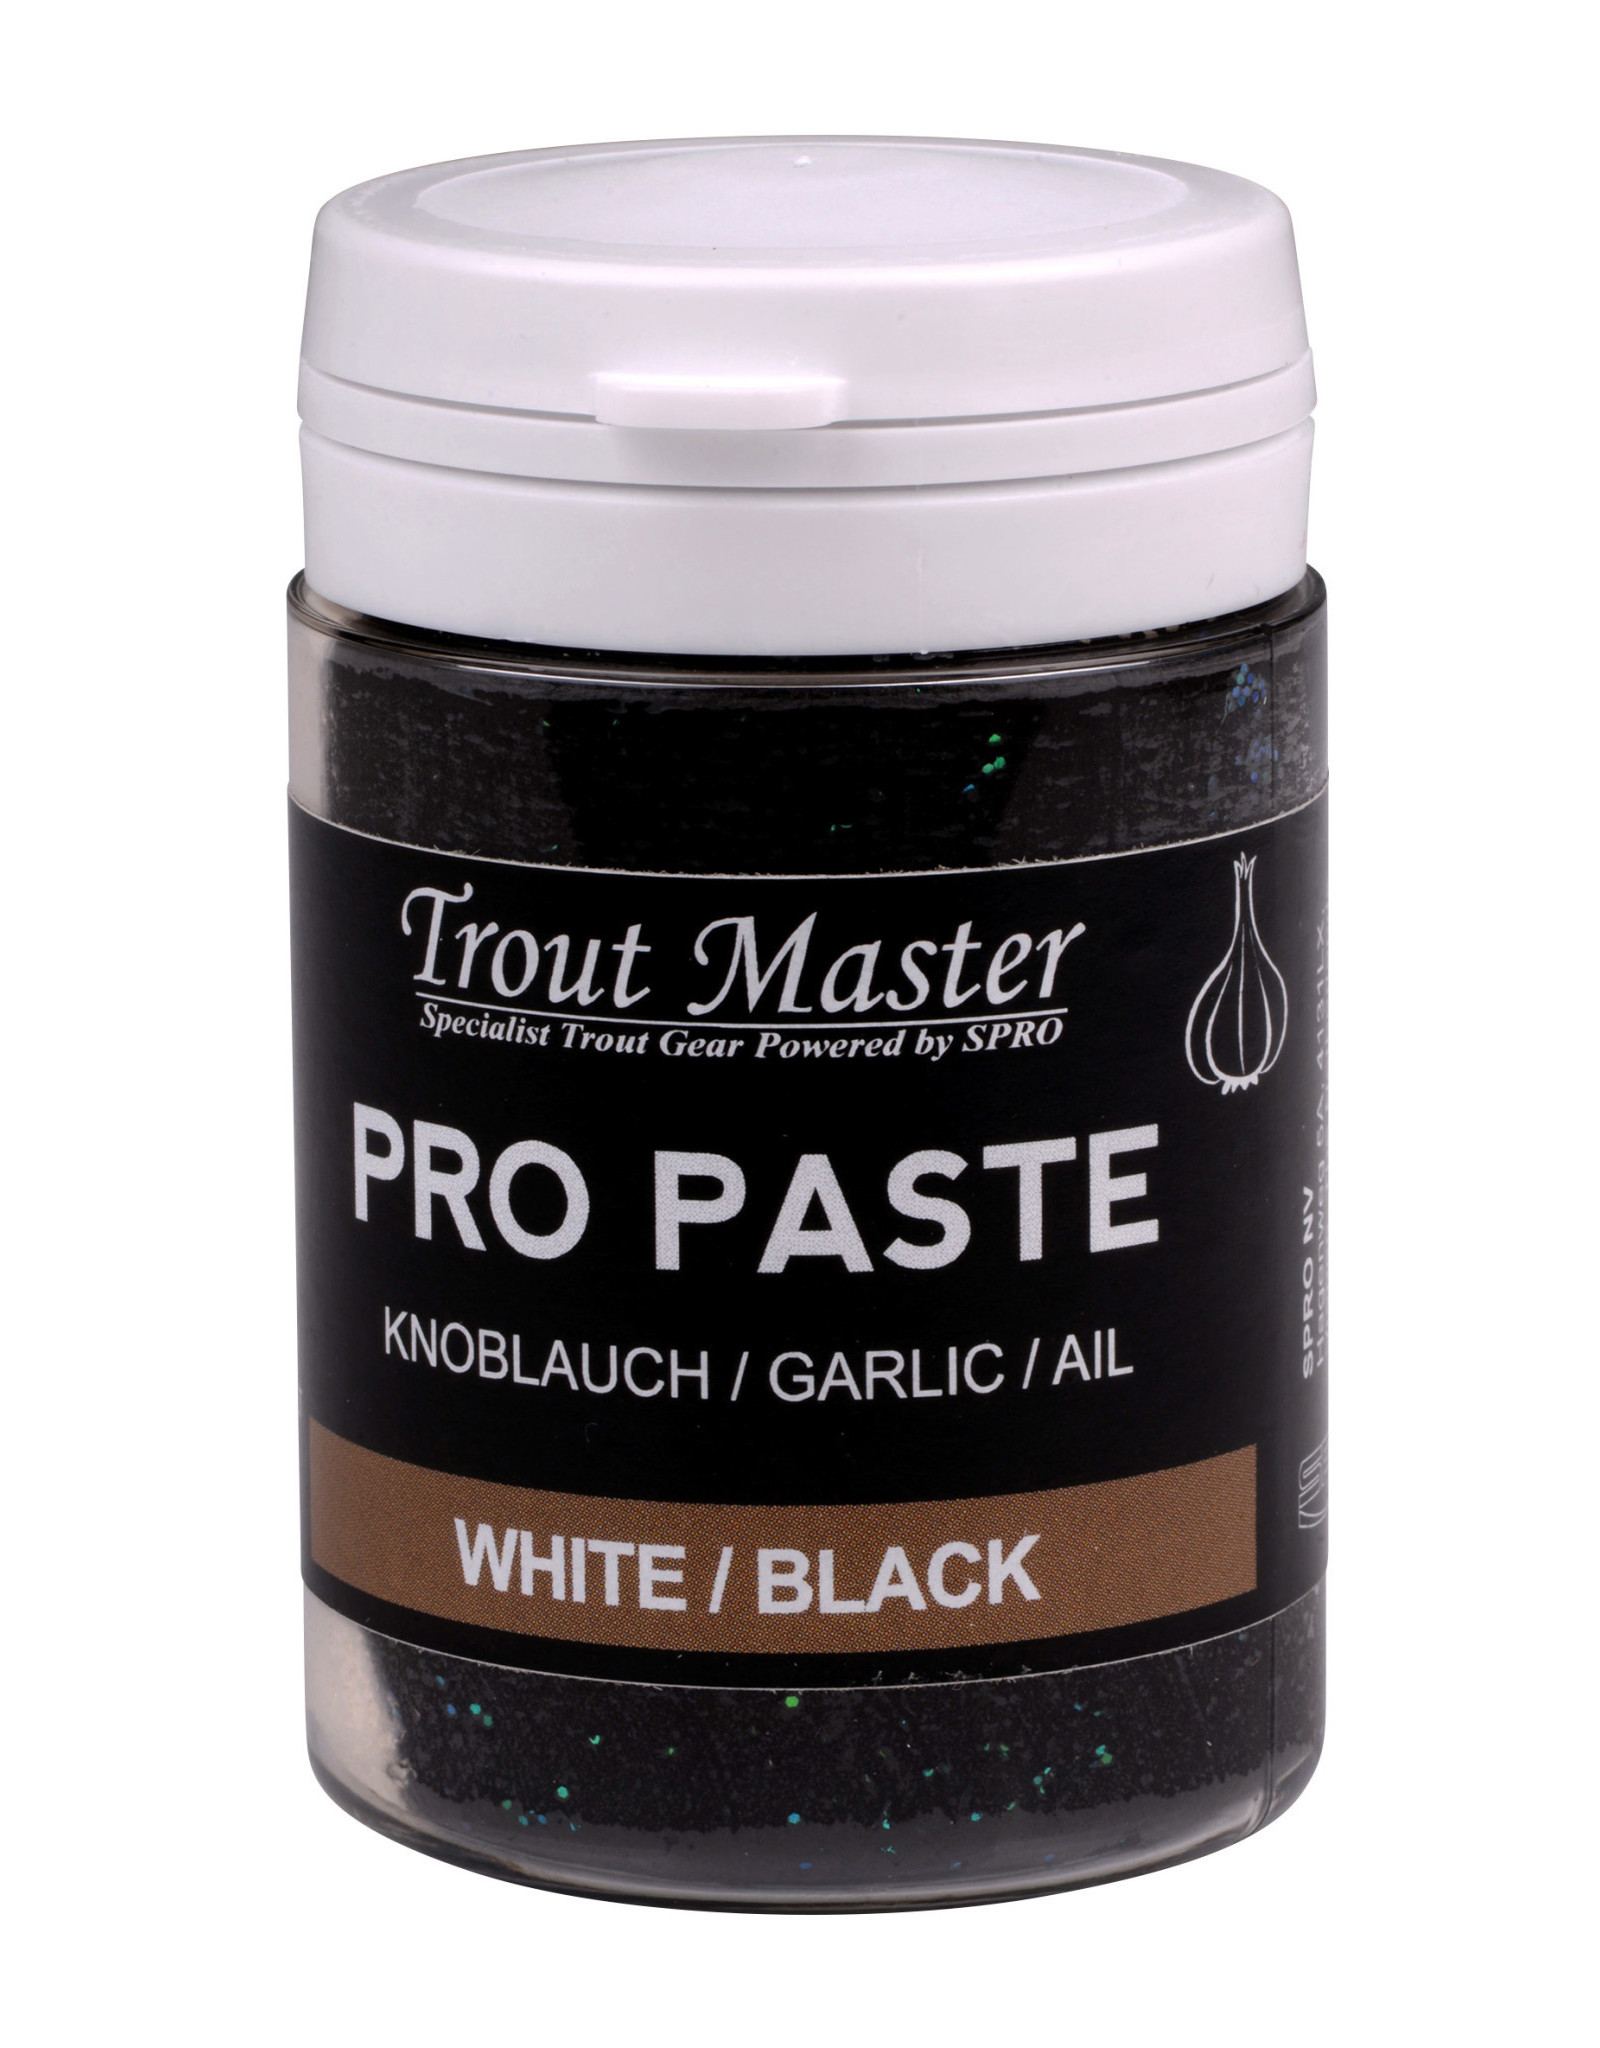 TROUT MASTER PRO PASTE WHITE / BLACK